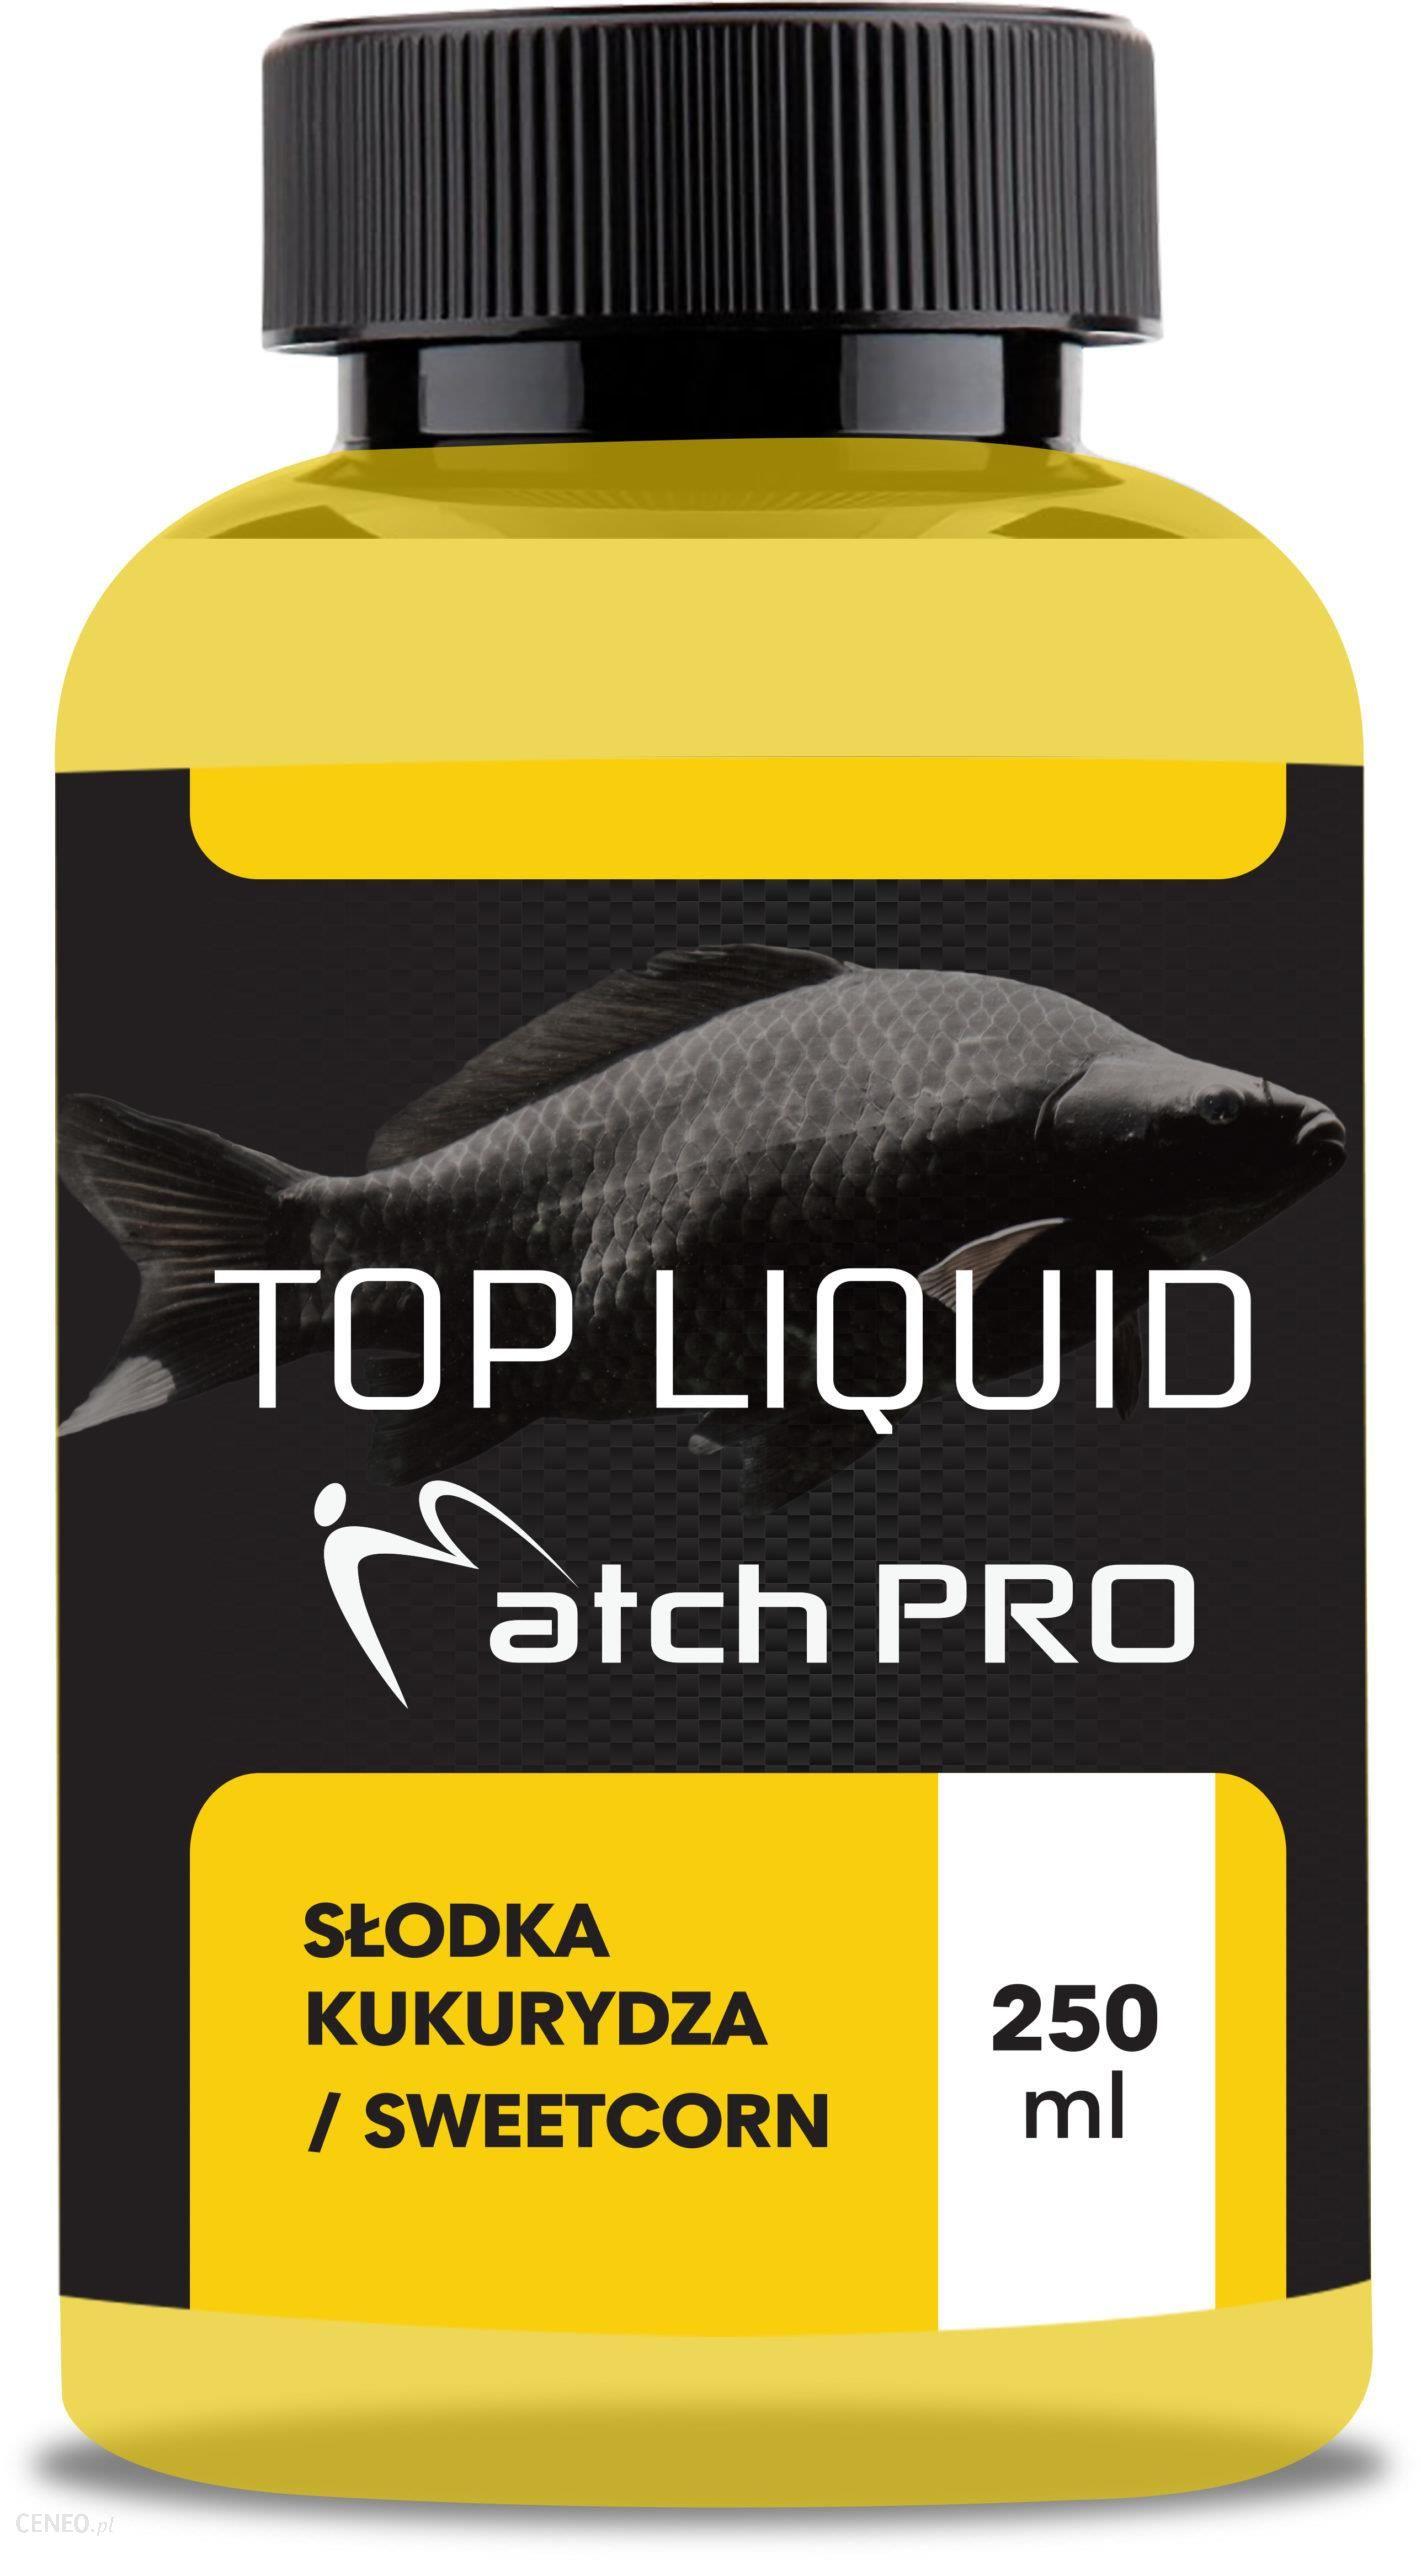 Matchpro Top Liquid Sweetcorn Słodka Kukurydza 250Ml